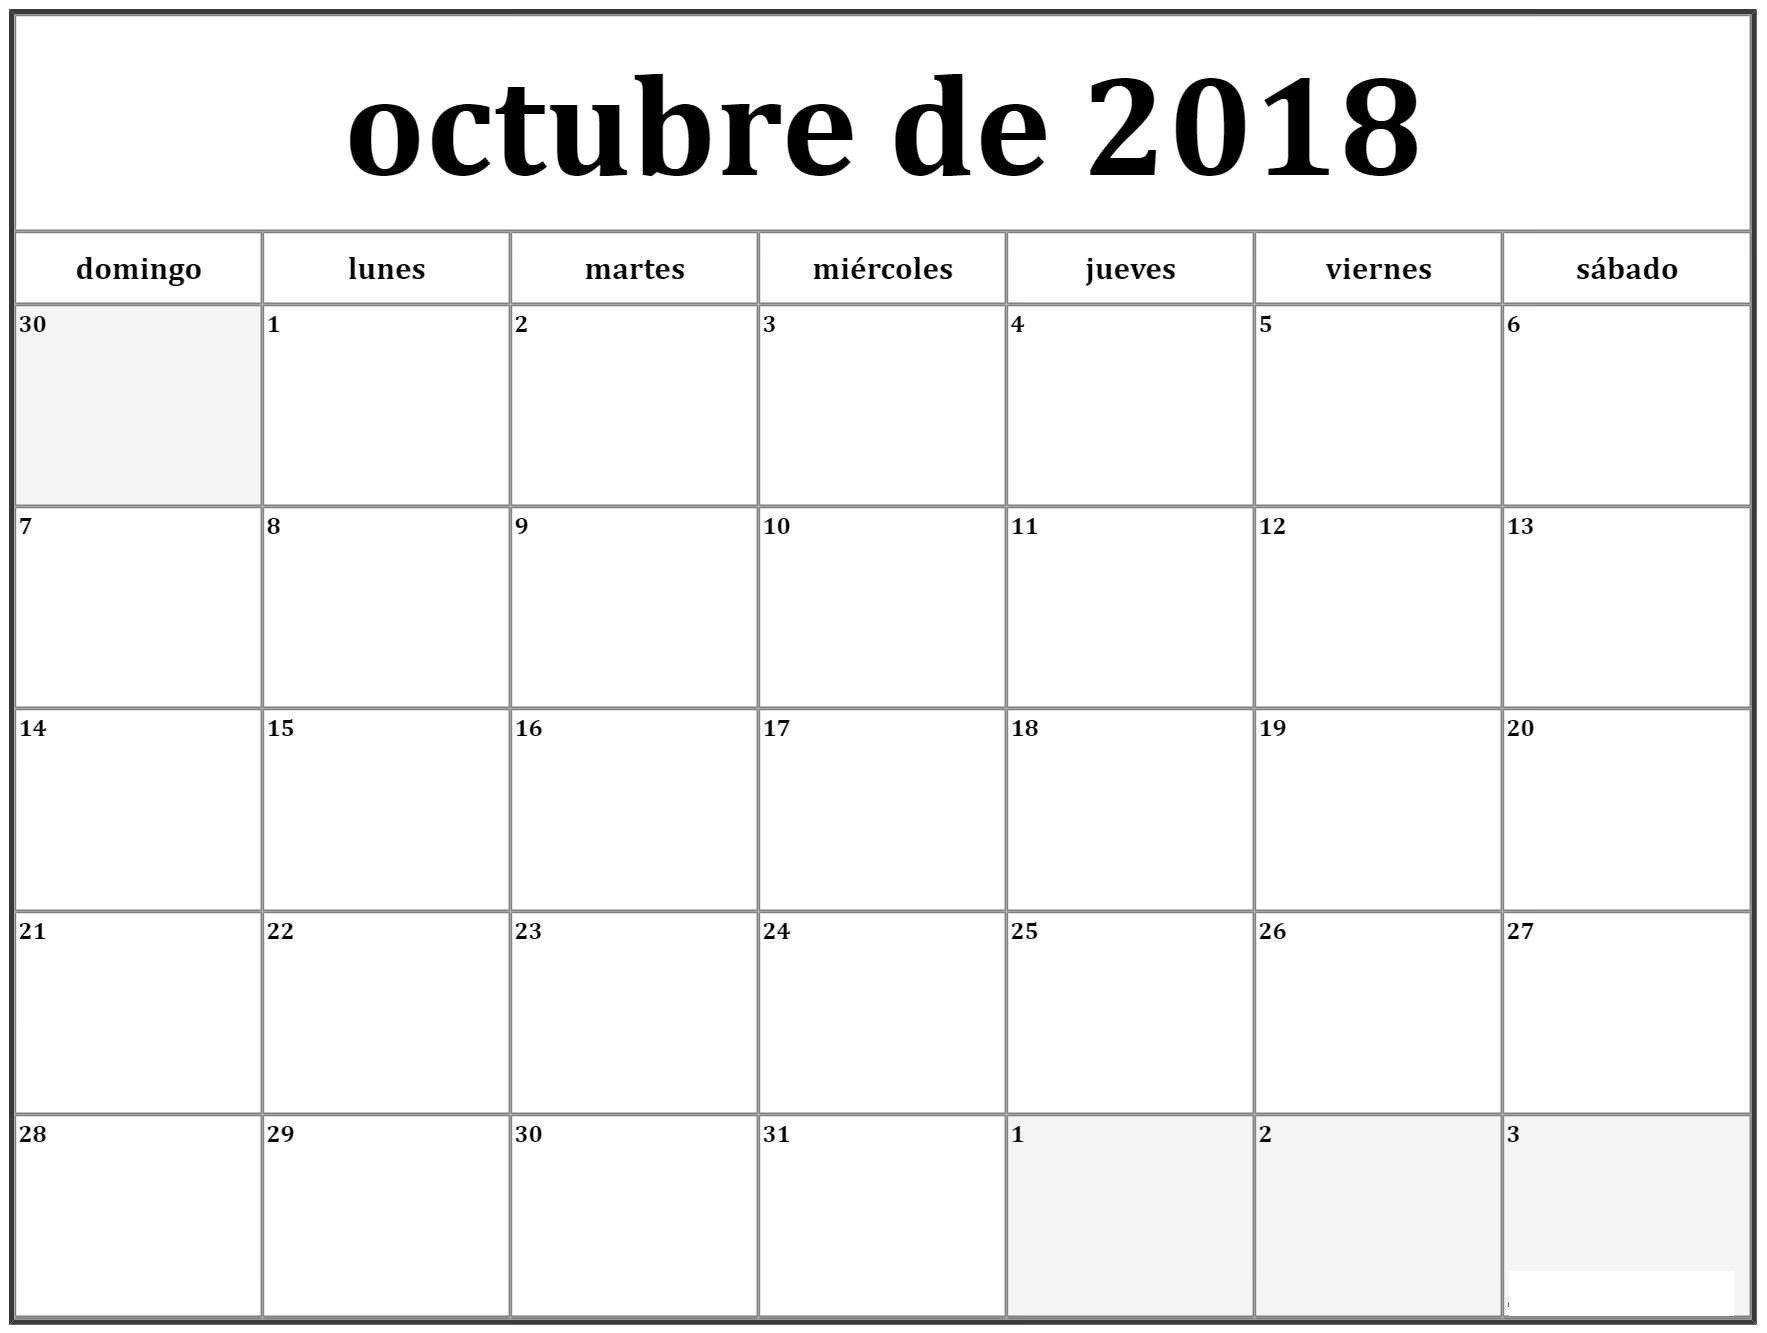 Calendario 2017 Colombia.Calendario Octubre 2018 Argentina Calendario Octubre 2018